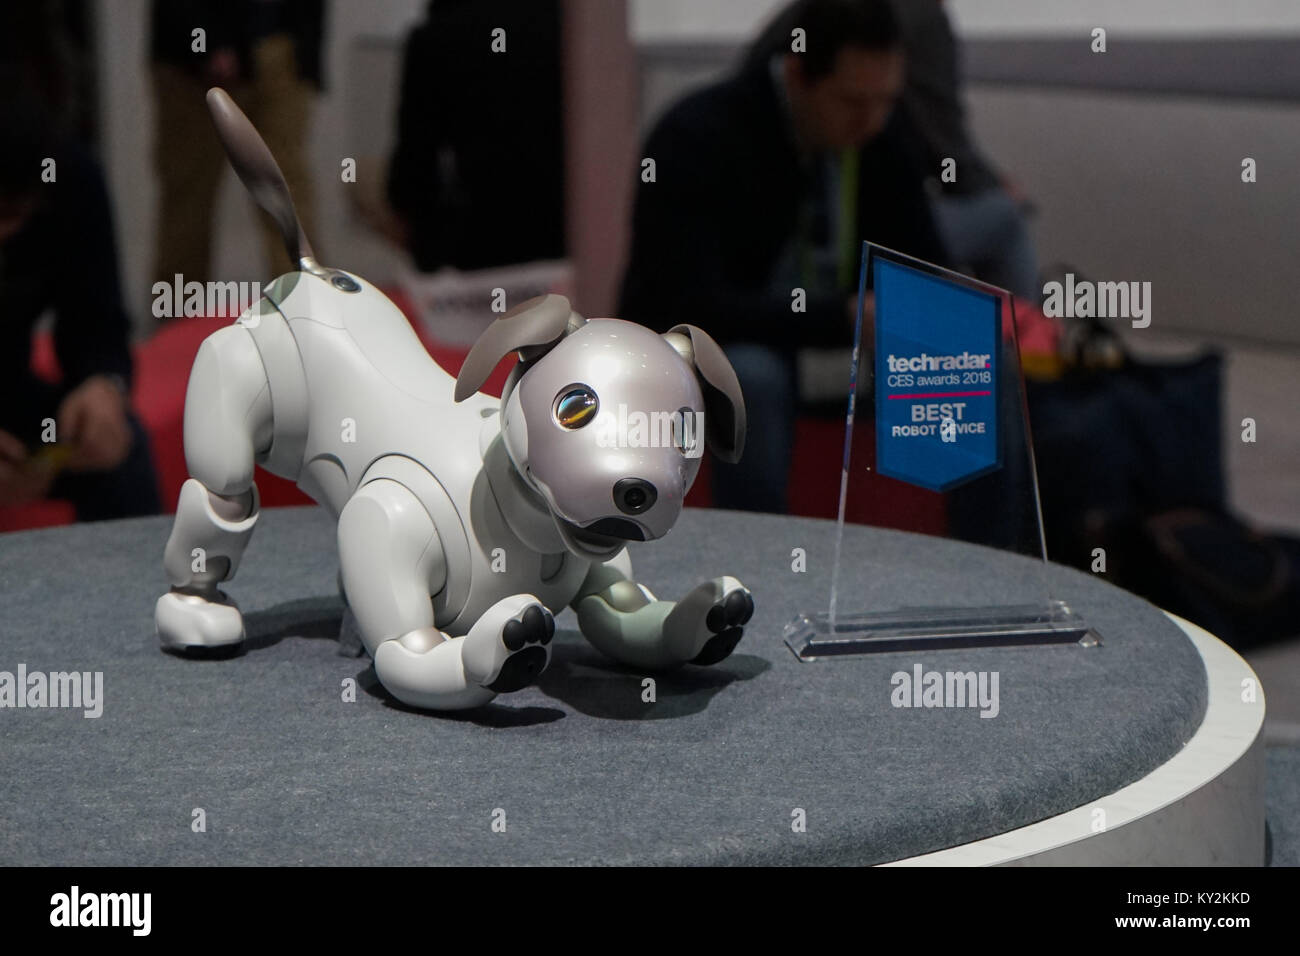 Las Vegas, Nevada, USA  11th Jan, 2018  Sony's robot dog